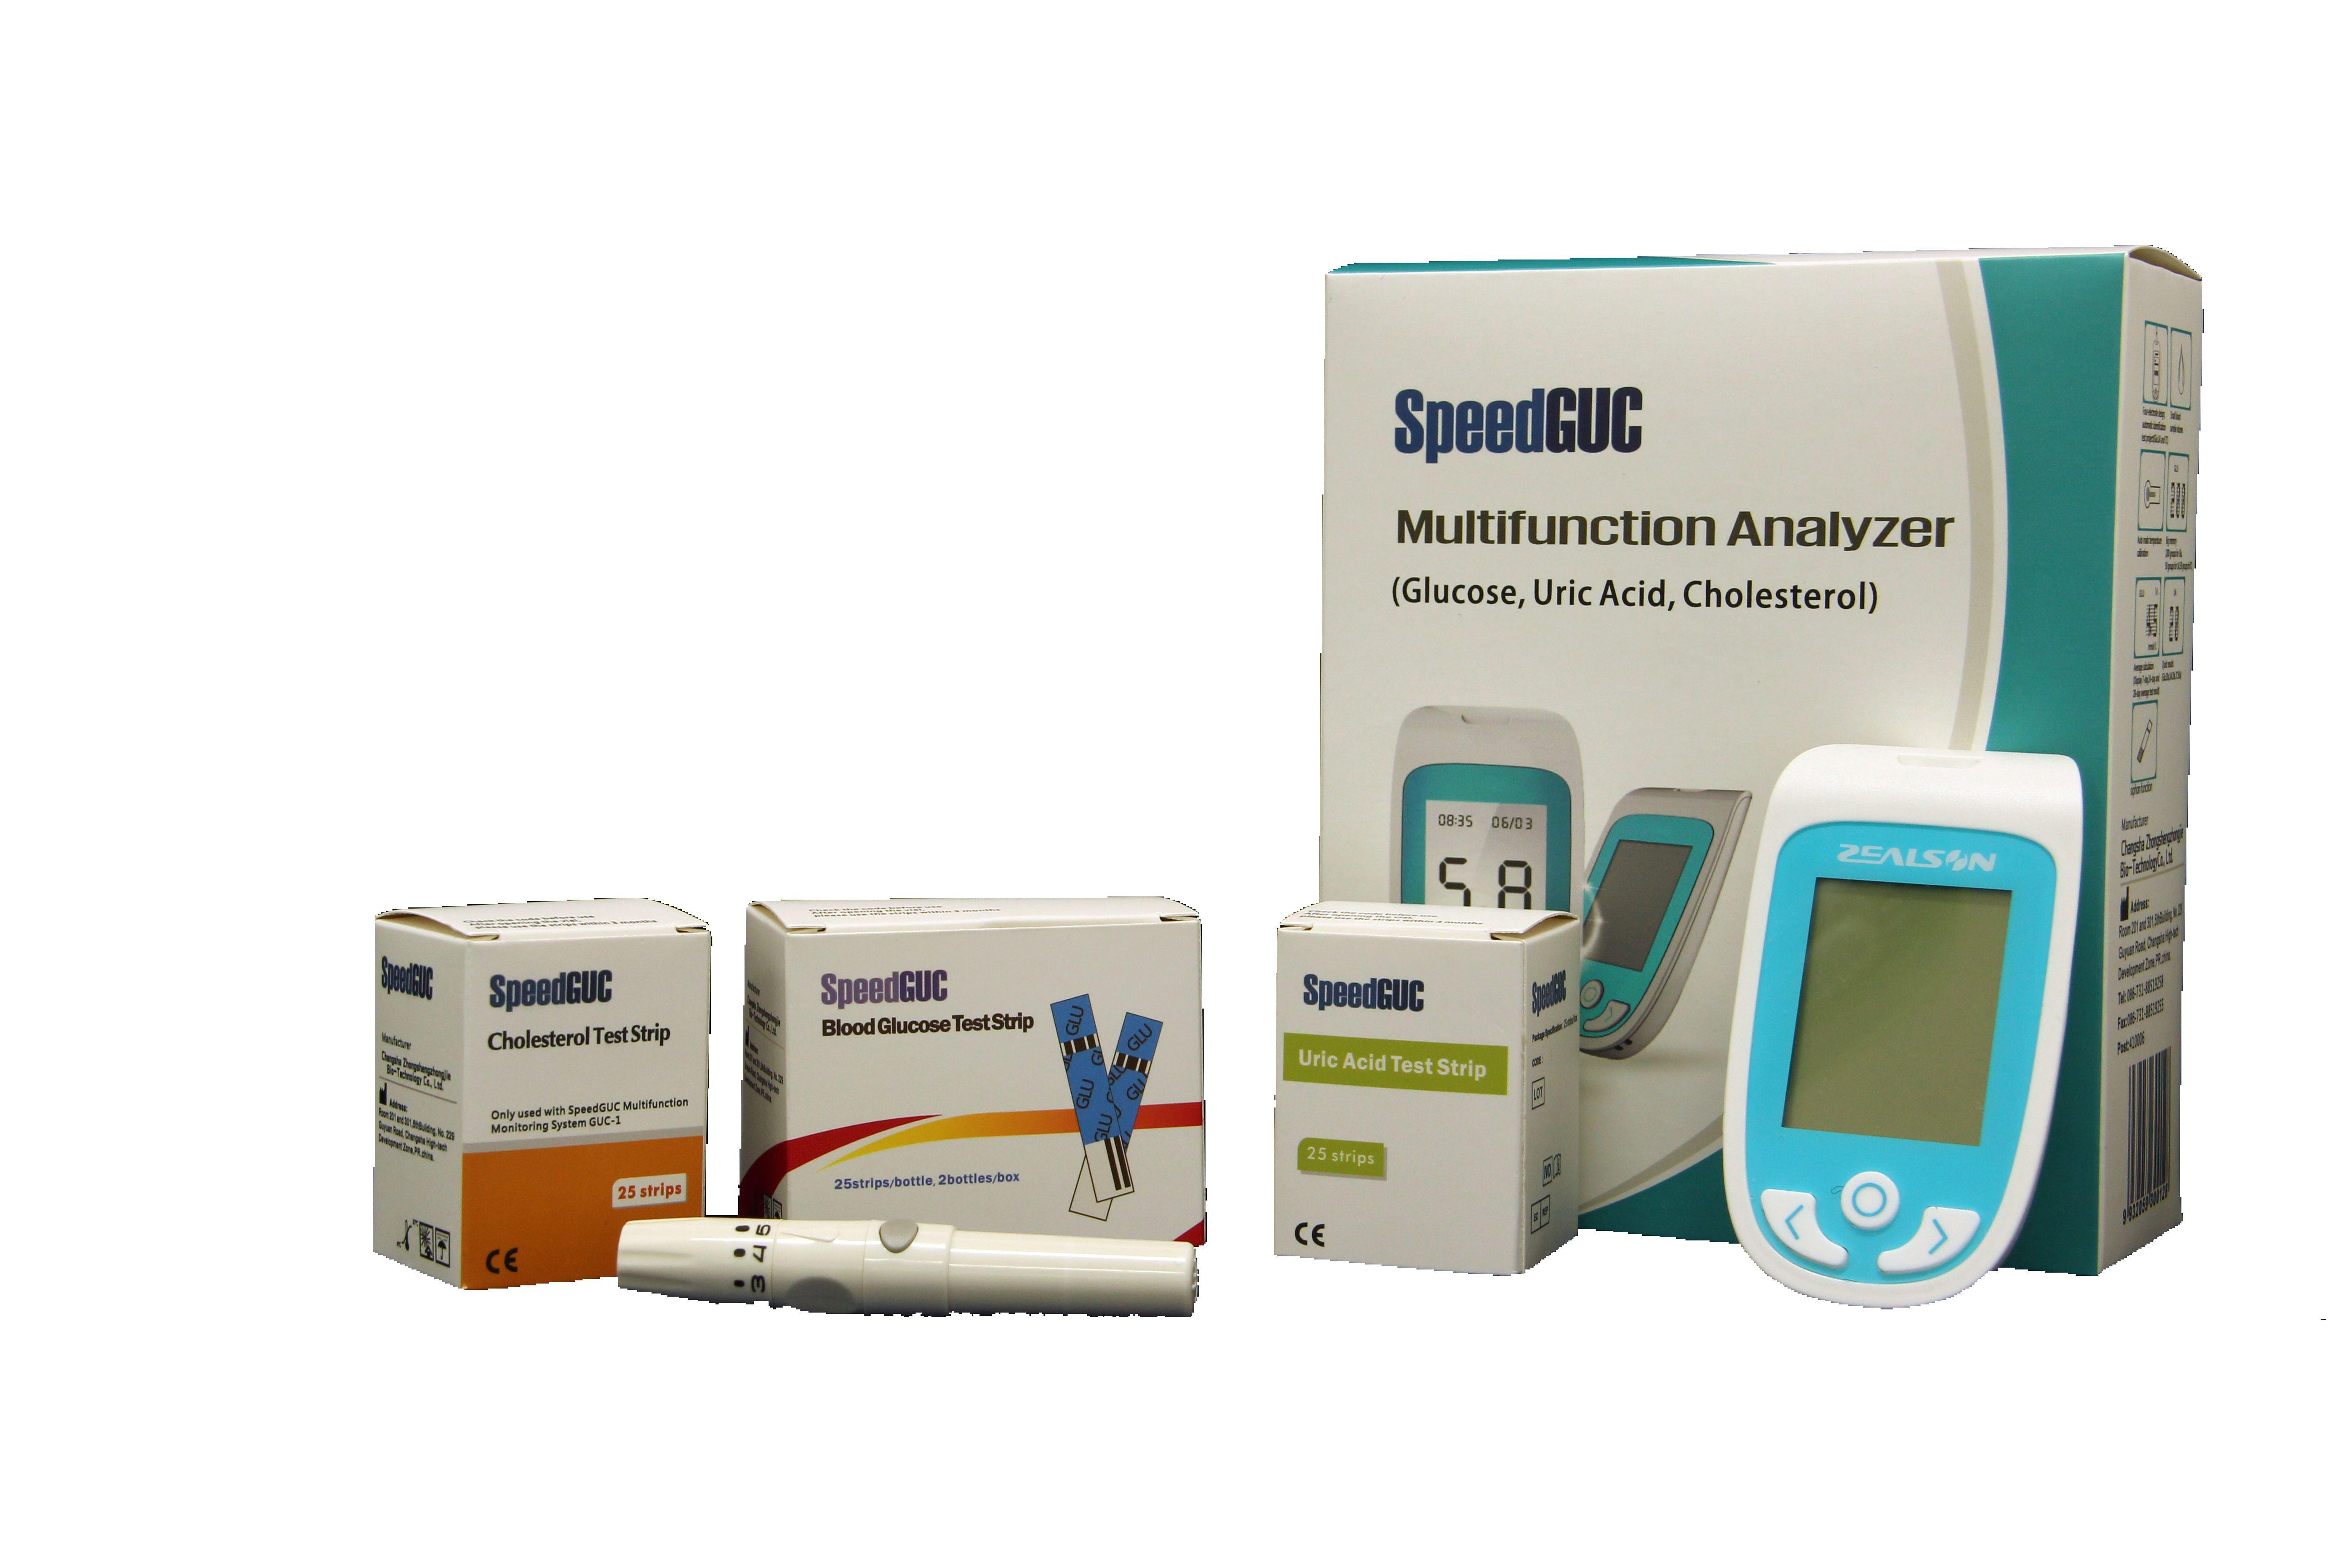 Speedguc multifunction analyzer (glucose,uric acid, cholesterol )